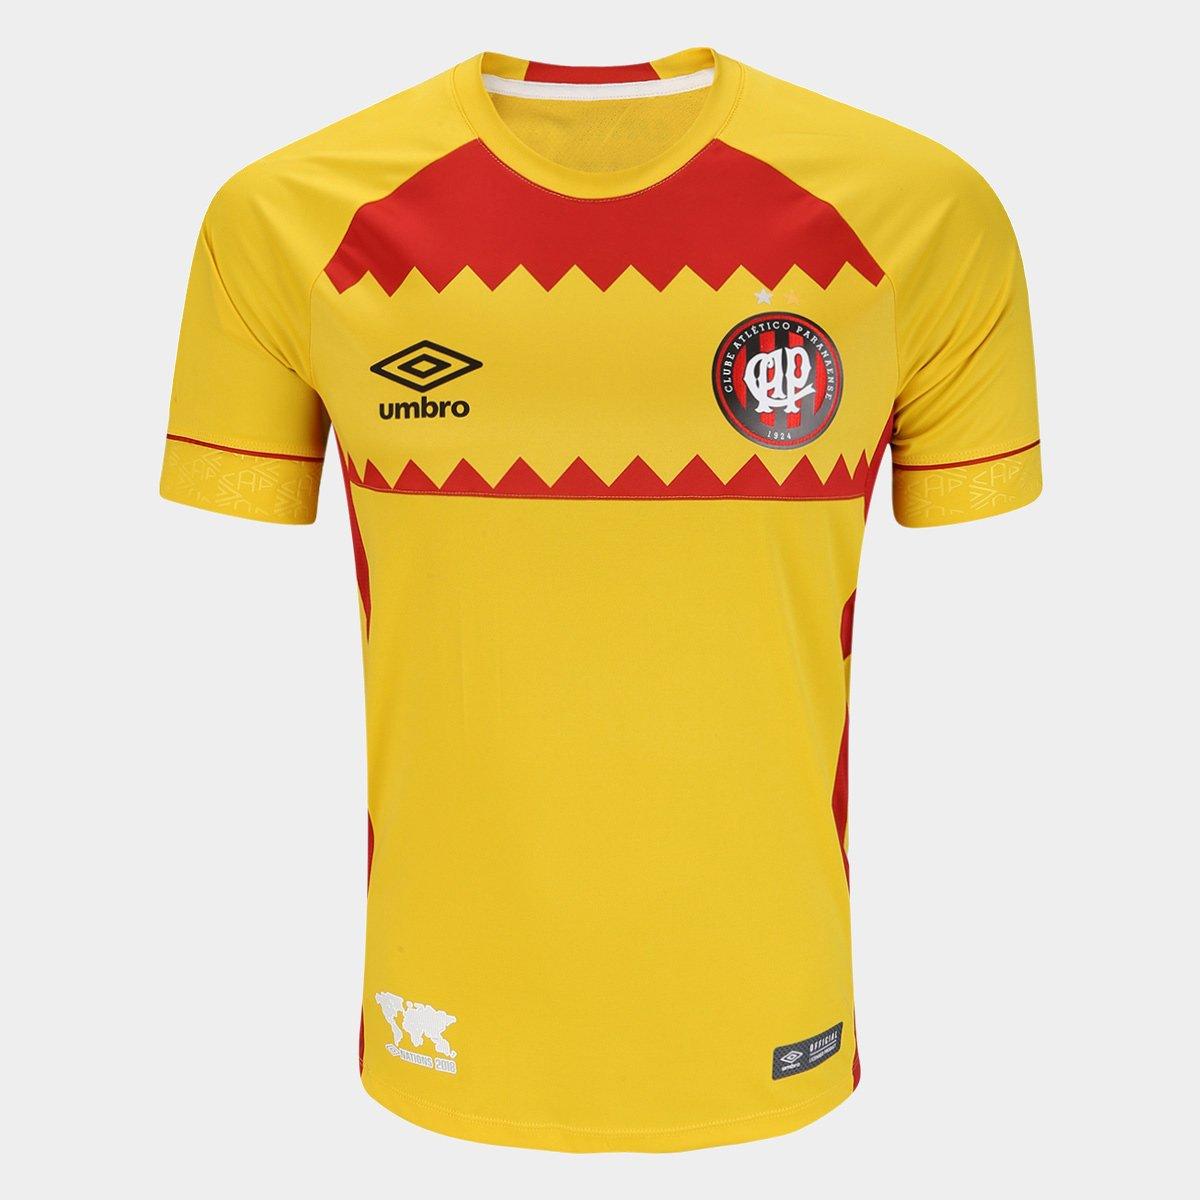 ff85830345 Camisa Athletico-PR II 2018 s n° El Huracan Torcedor Umbro Masculina -  Compre Agora